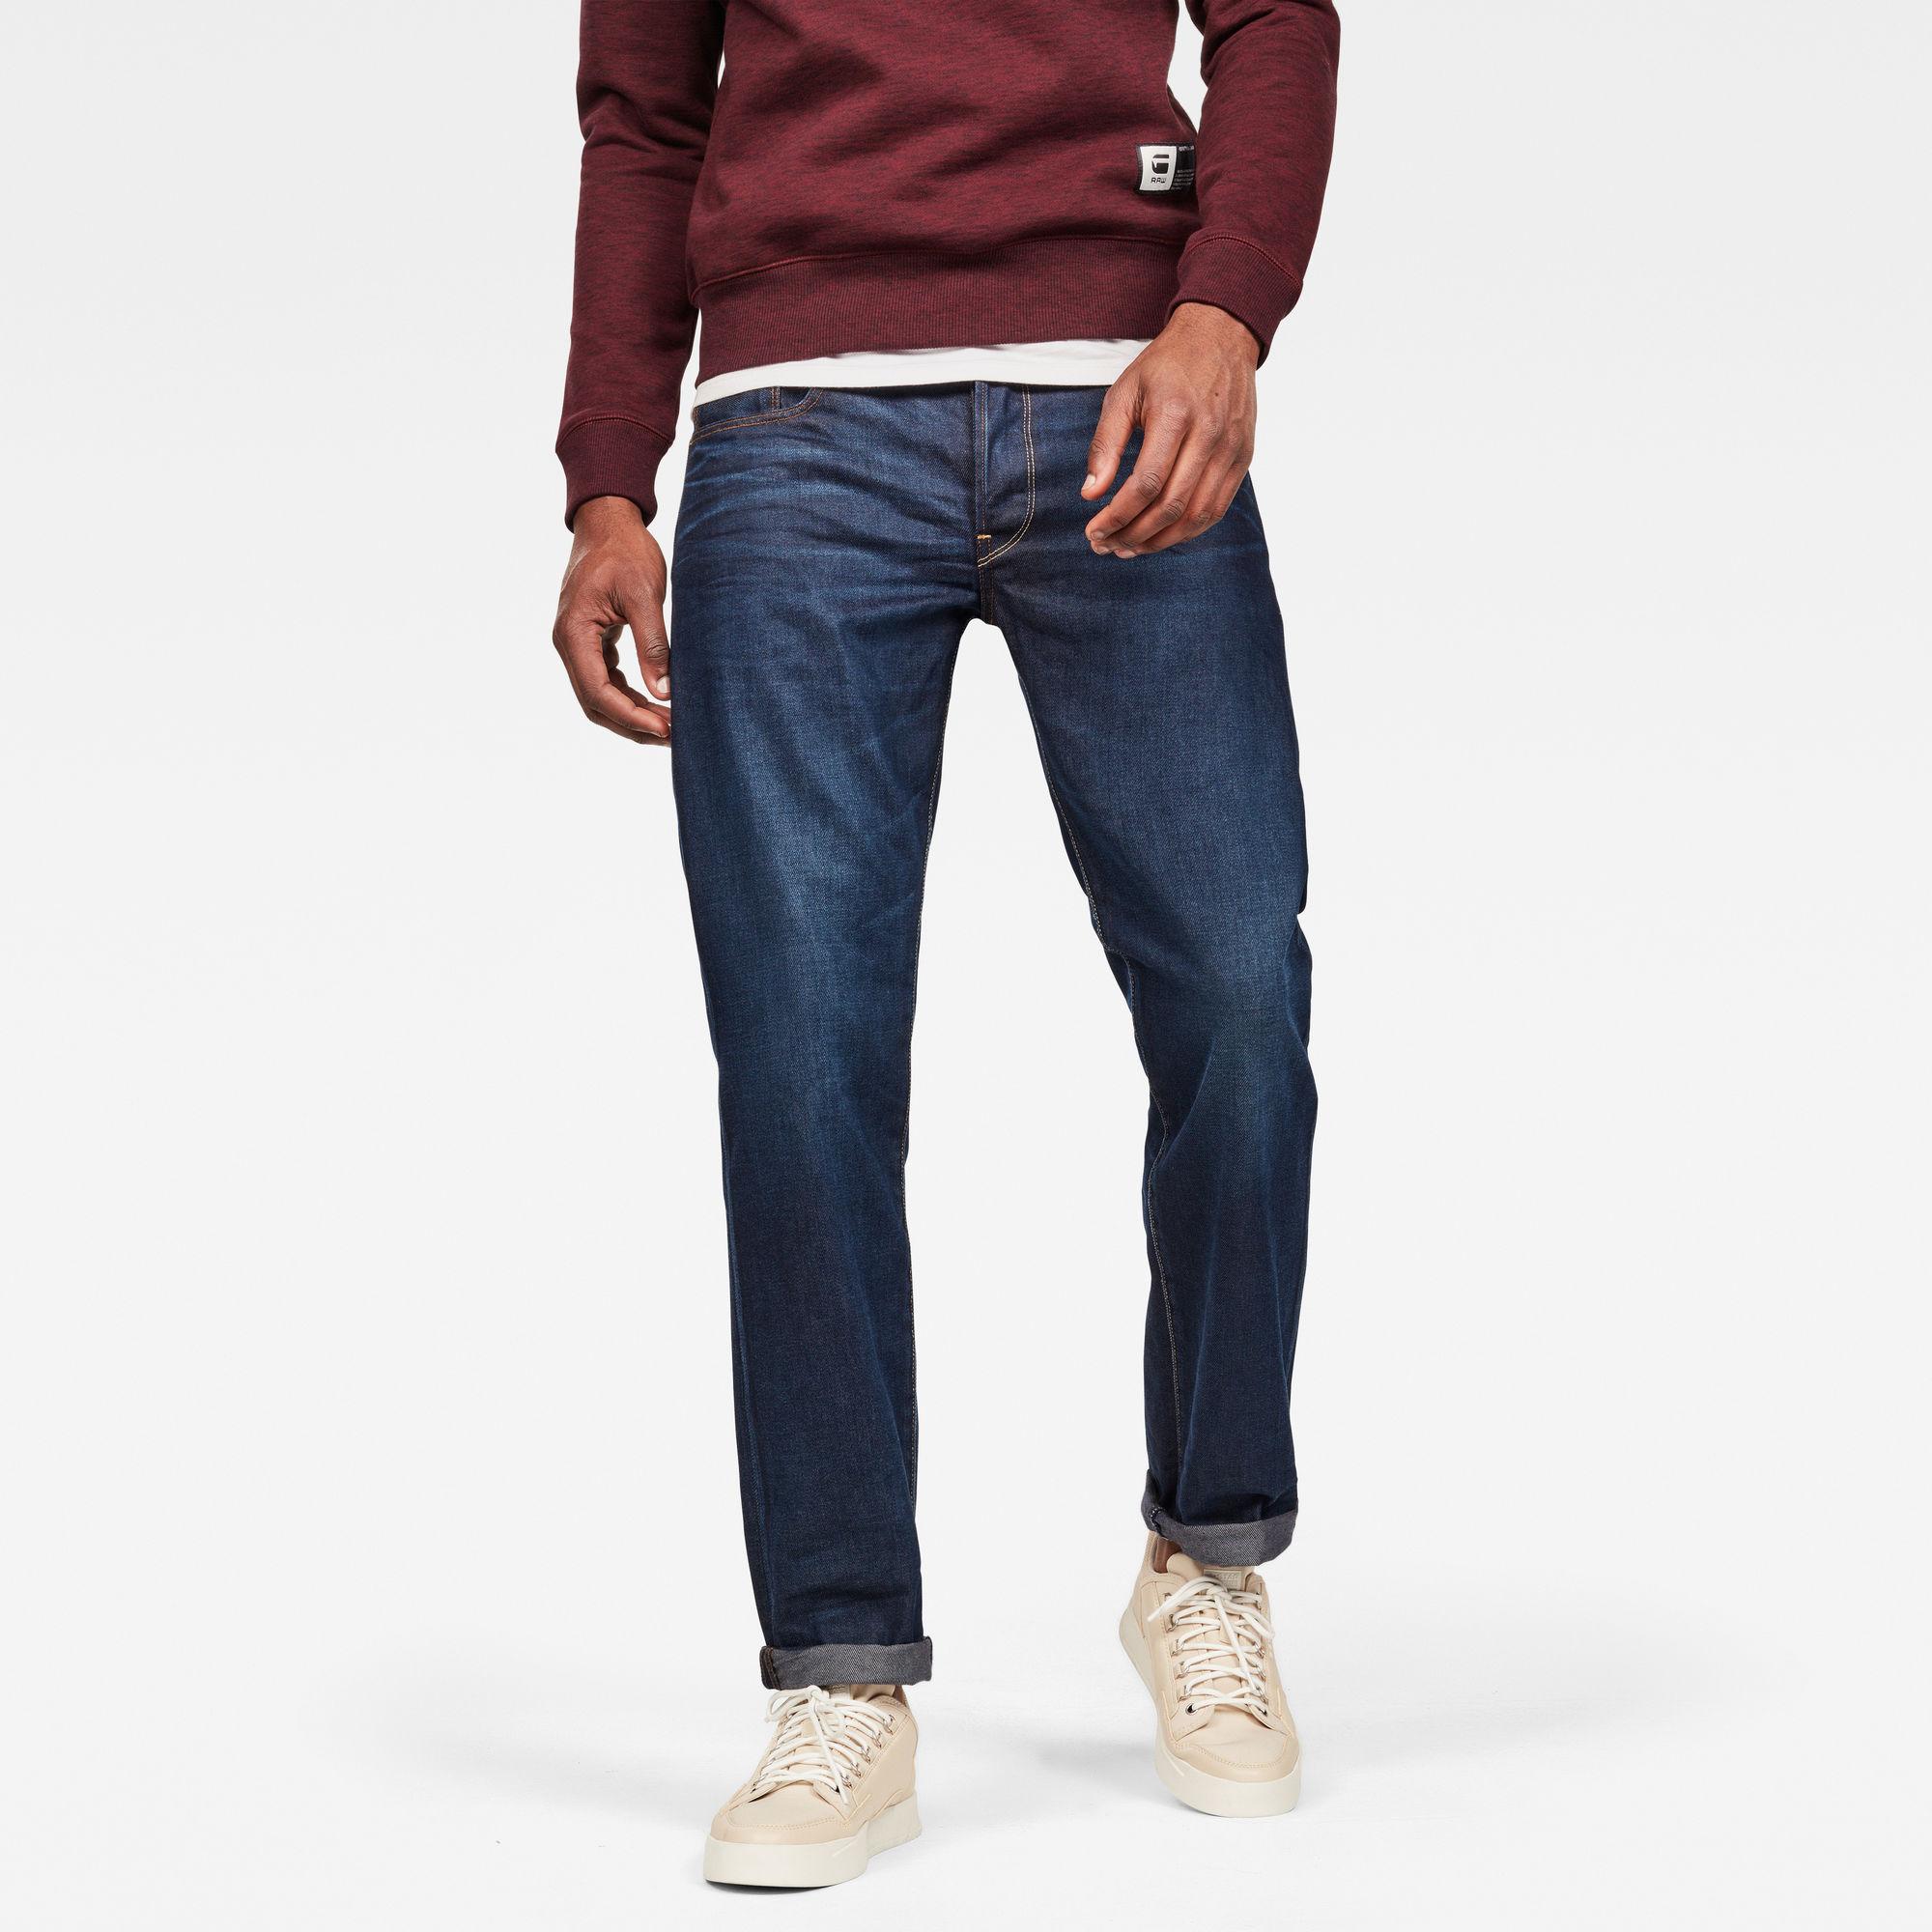 3301 Straight Jeans kopen Donkerblauw